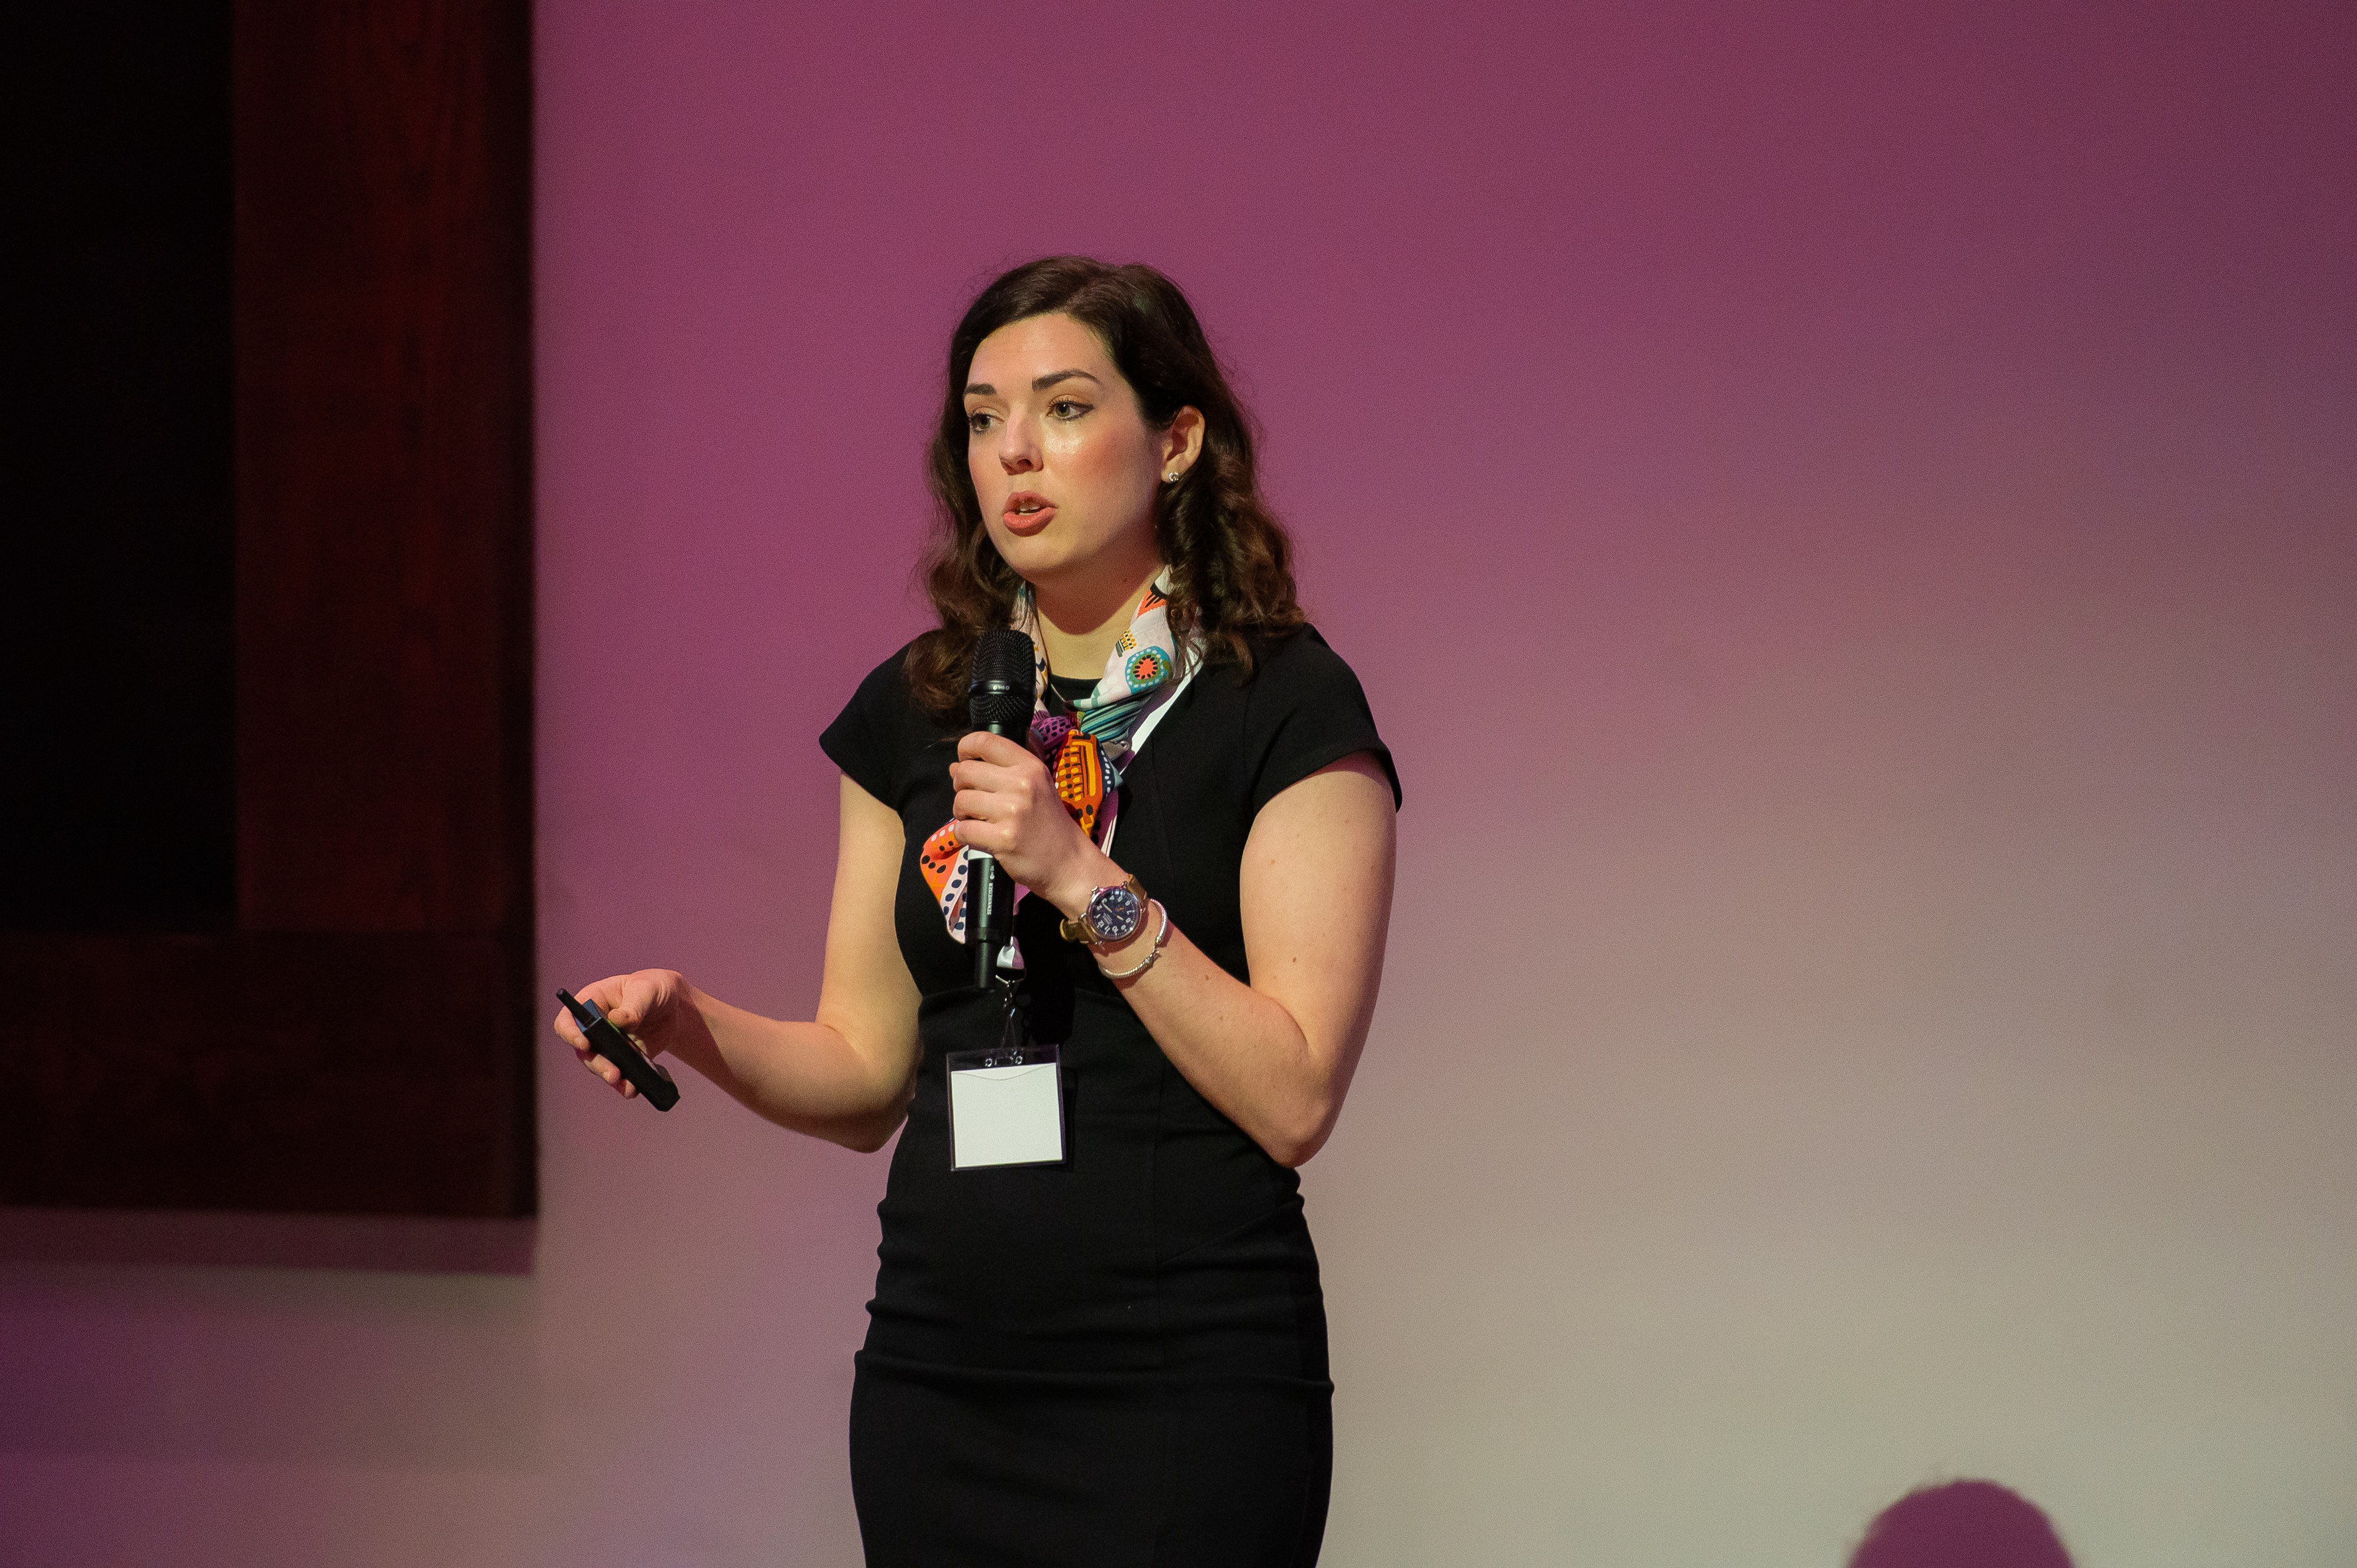 Kathryn Austin from AVIA presenting marketinsights